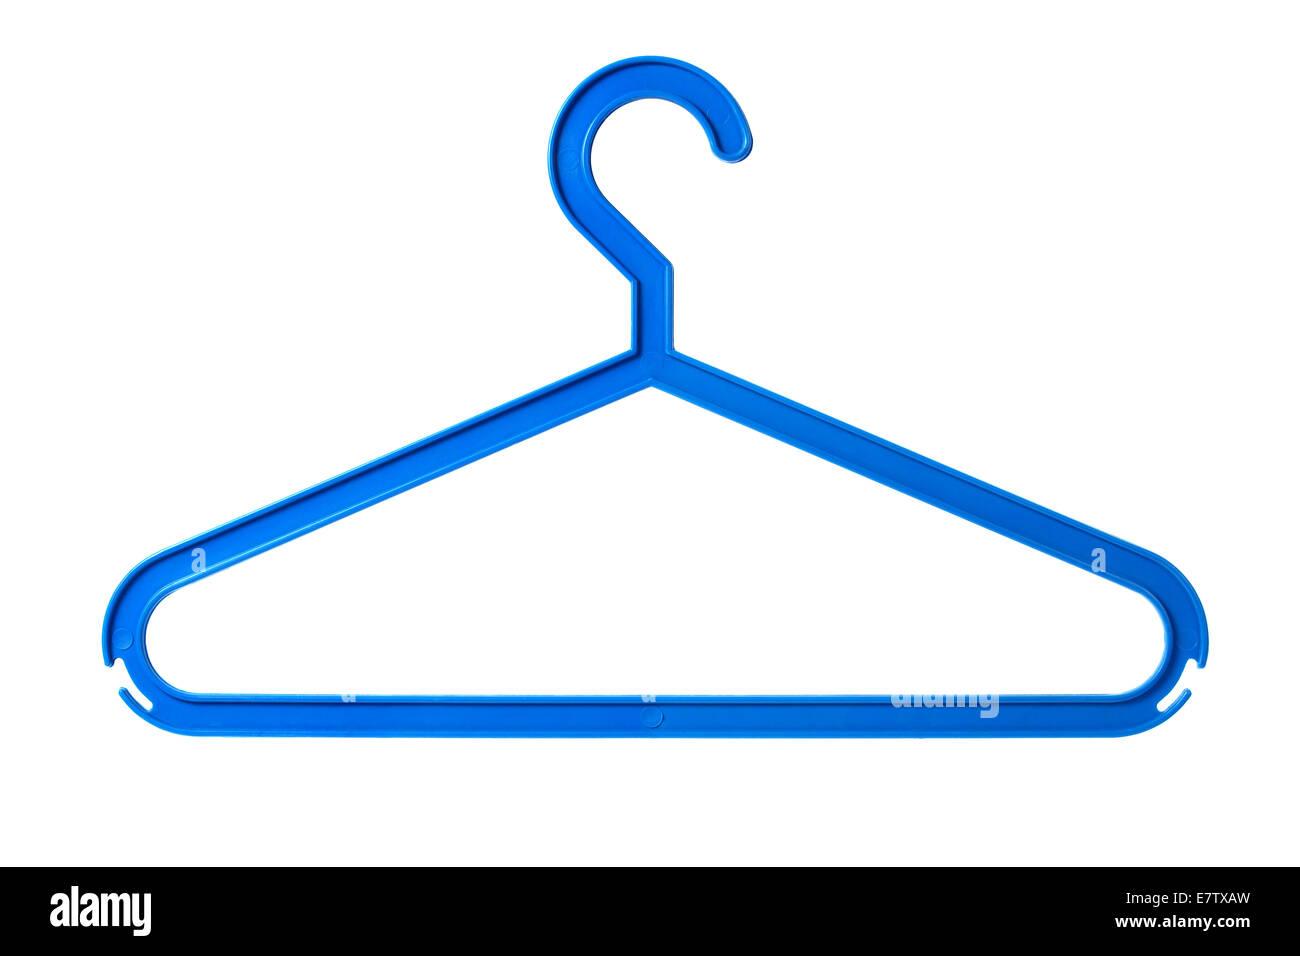 Plastic hanger - Stock Image